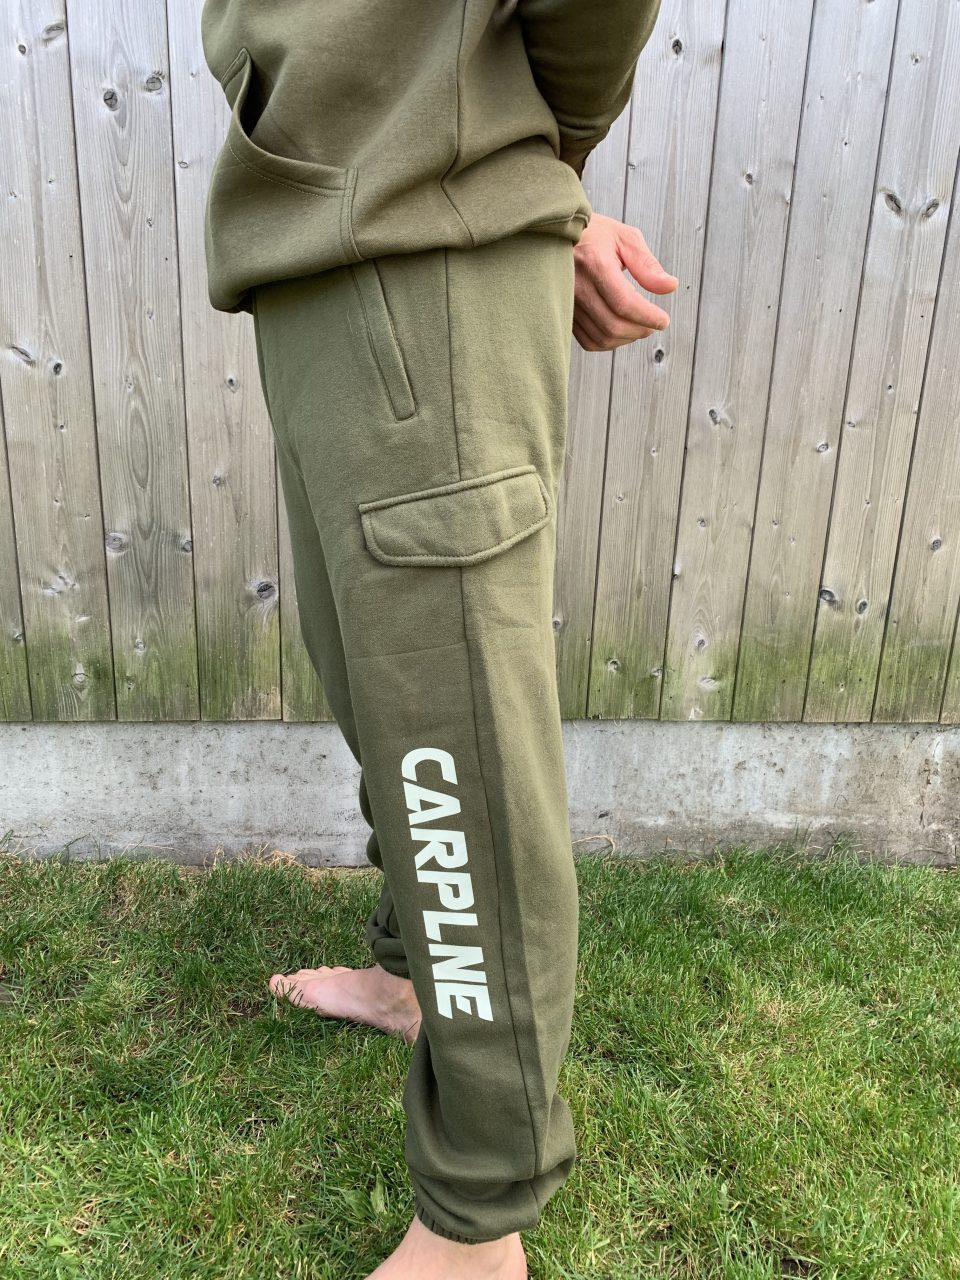 Je bekijkt nu CarpLne 5 pocket karper jogger mega korting